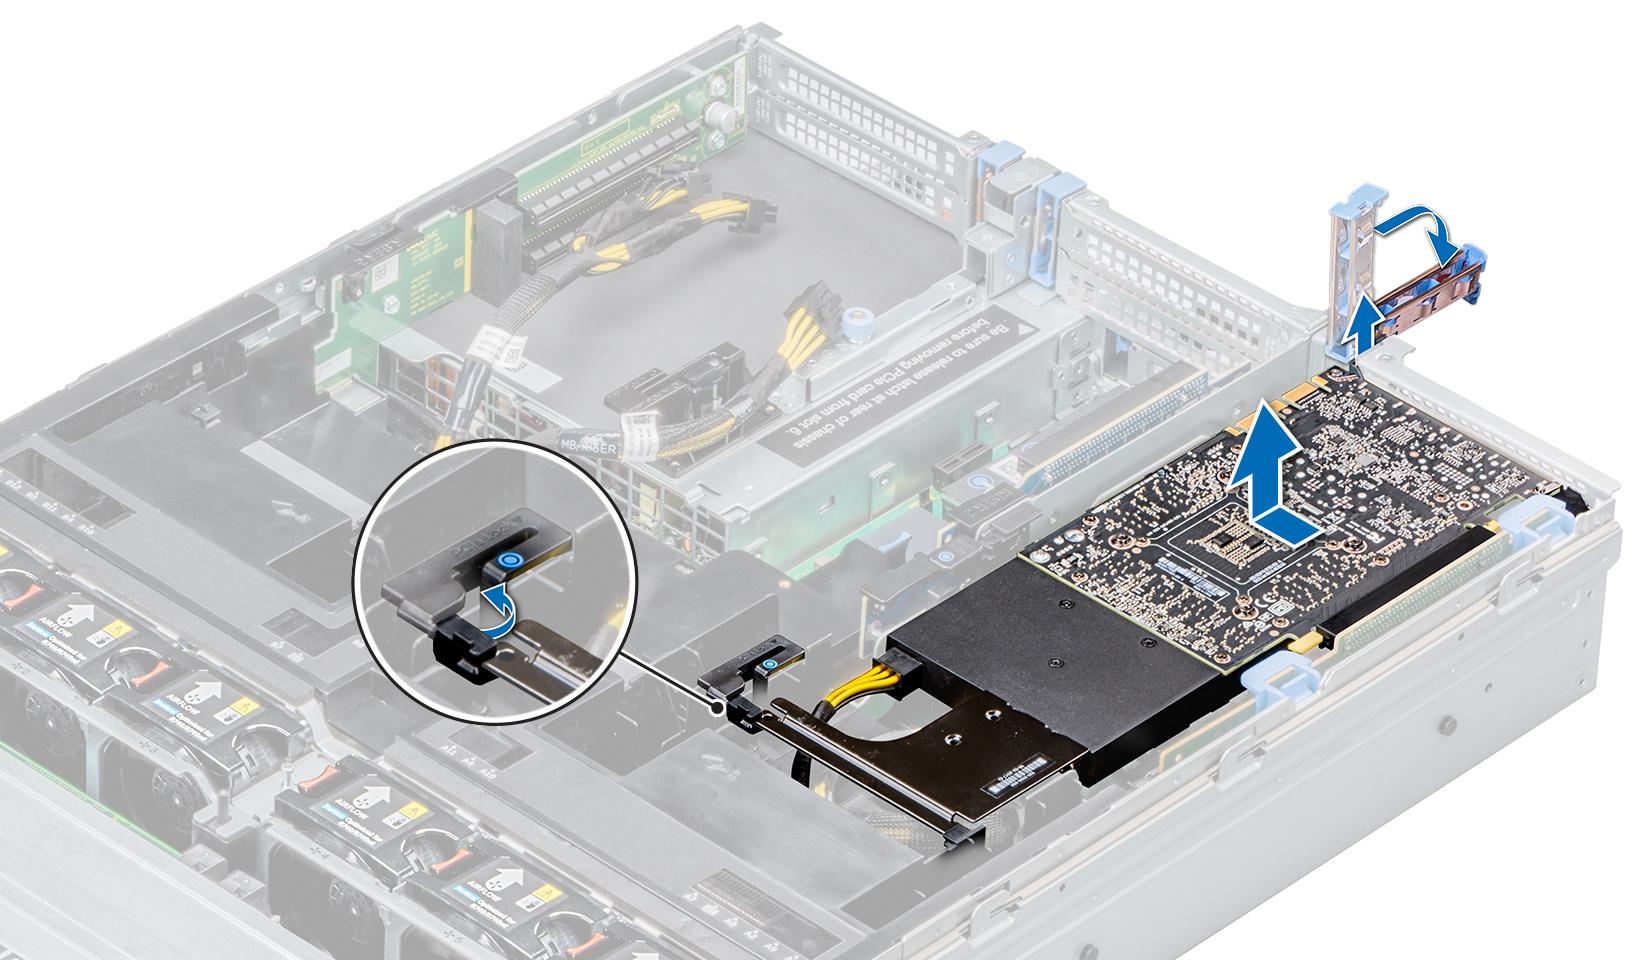 Dell EMC PowerEdge R740 Installation and Service Manual